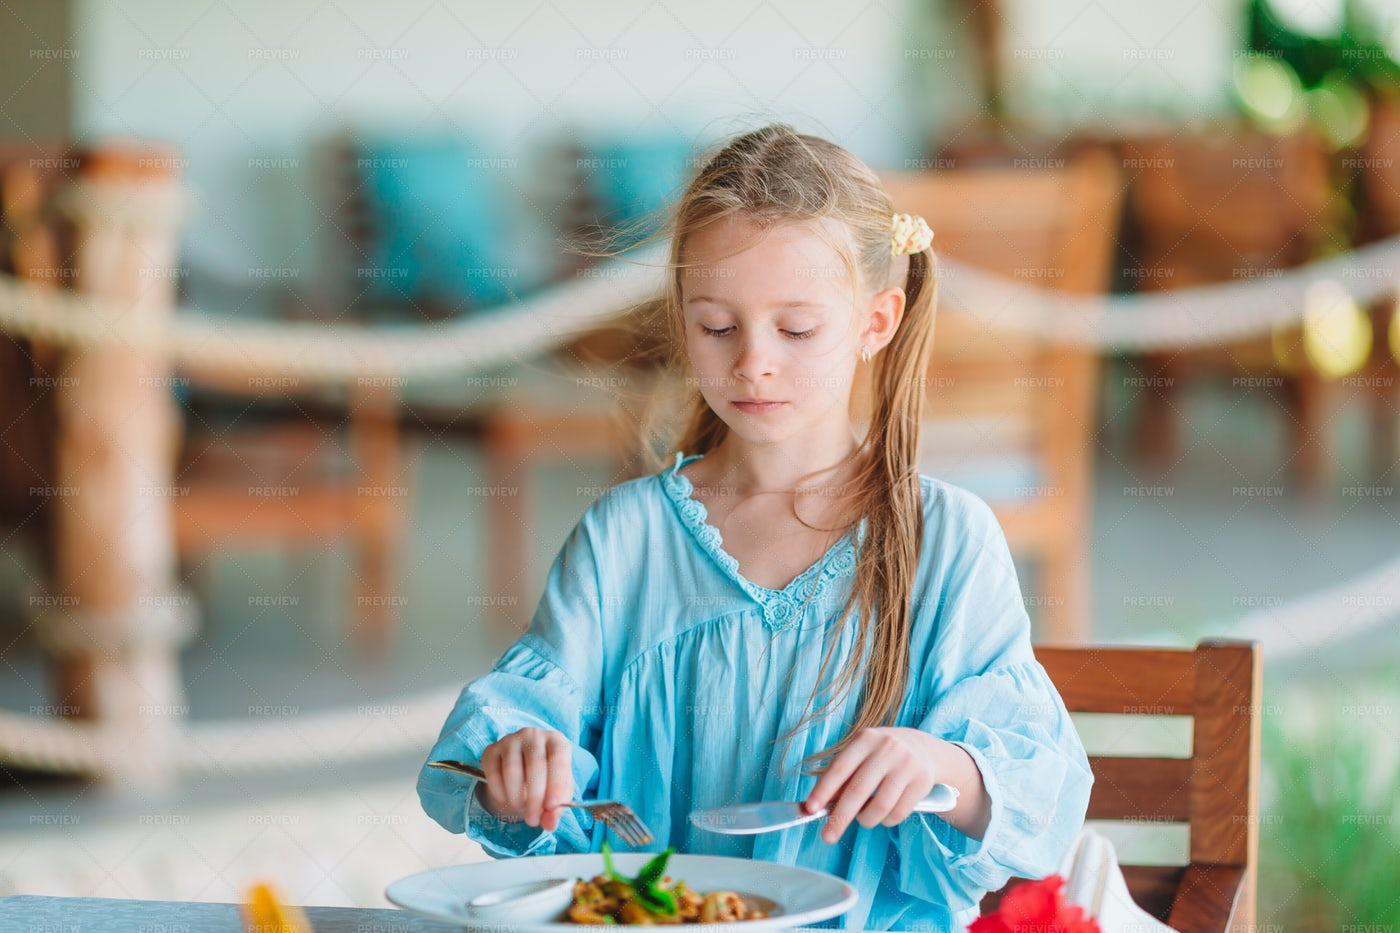 Eating On Outdoor Patio: Stock Photos